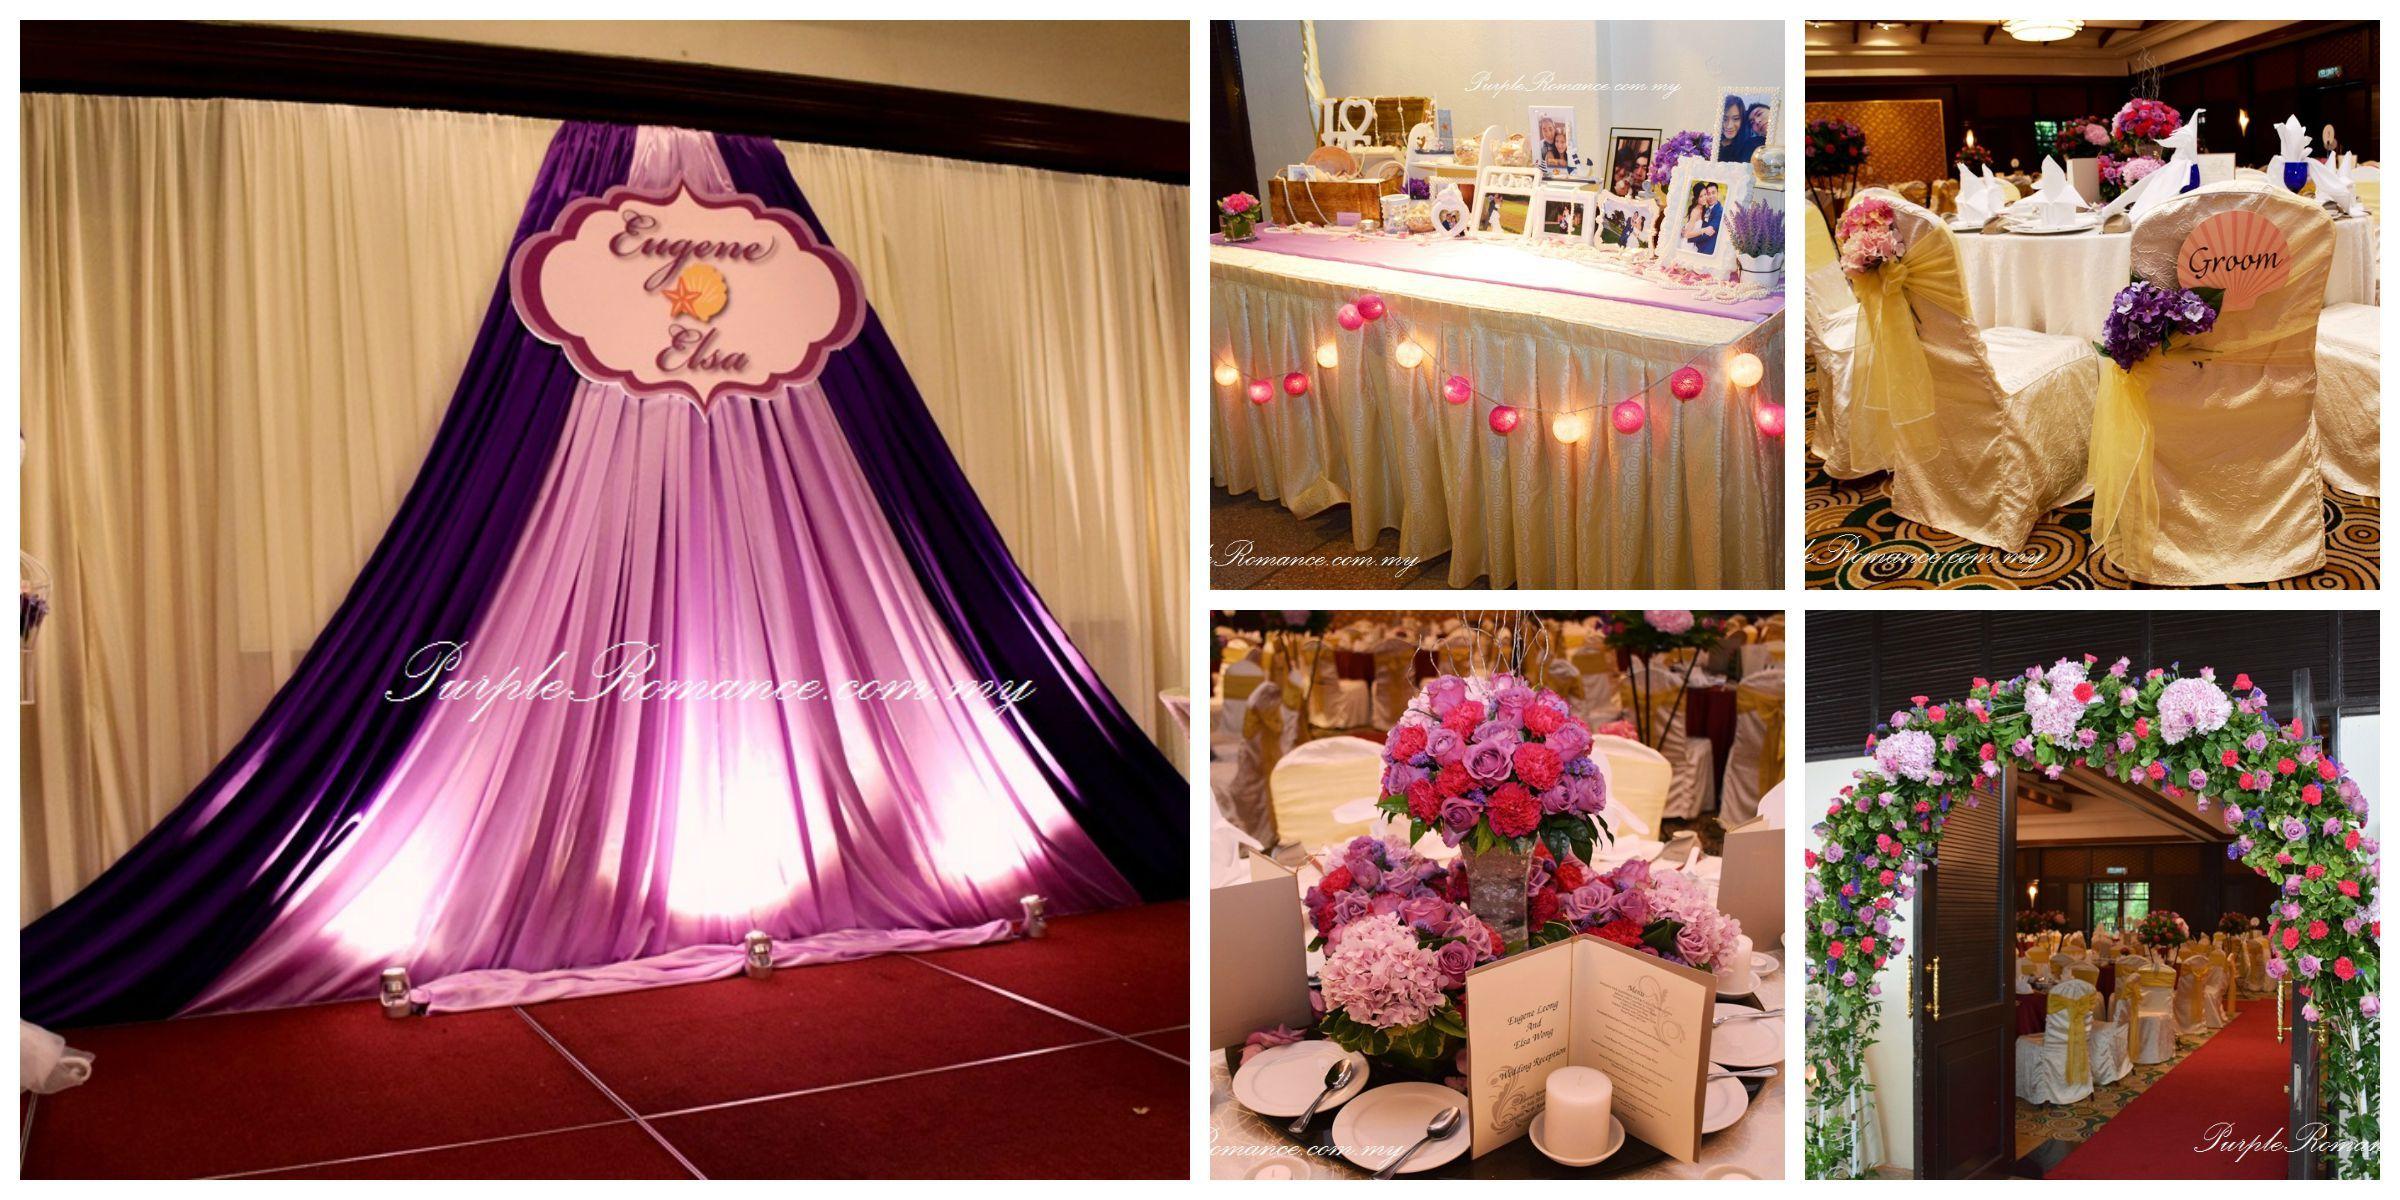 Stage Backdrop Wedding Decoration | Wedding backdrop ...